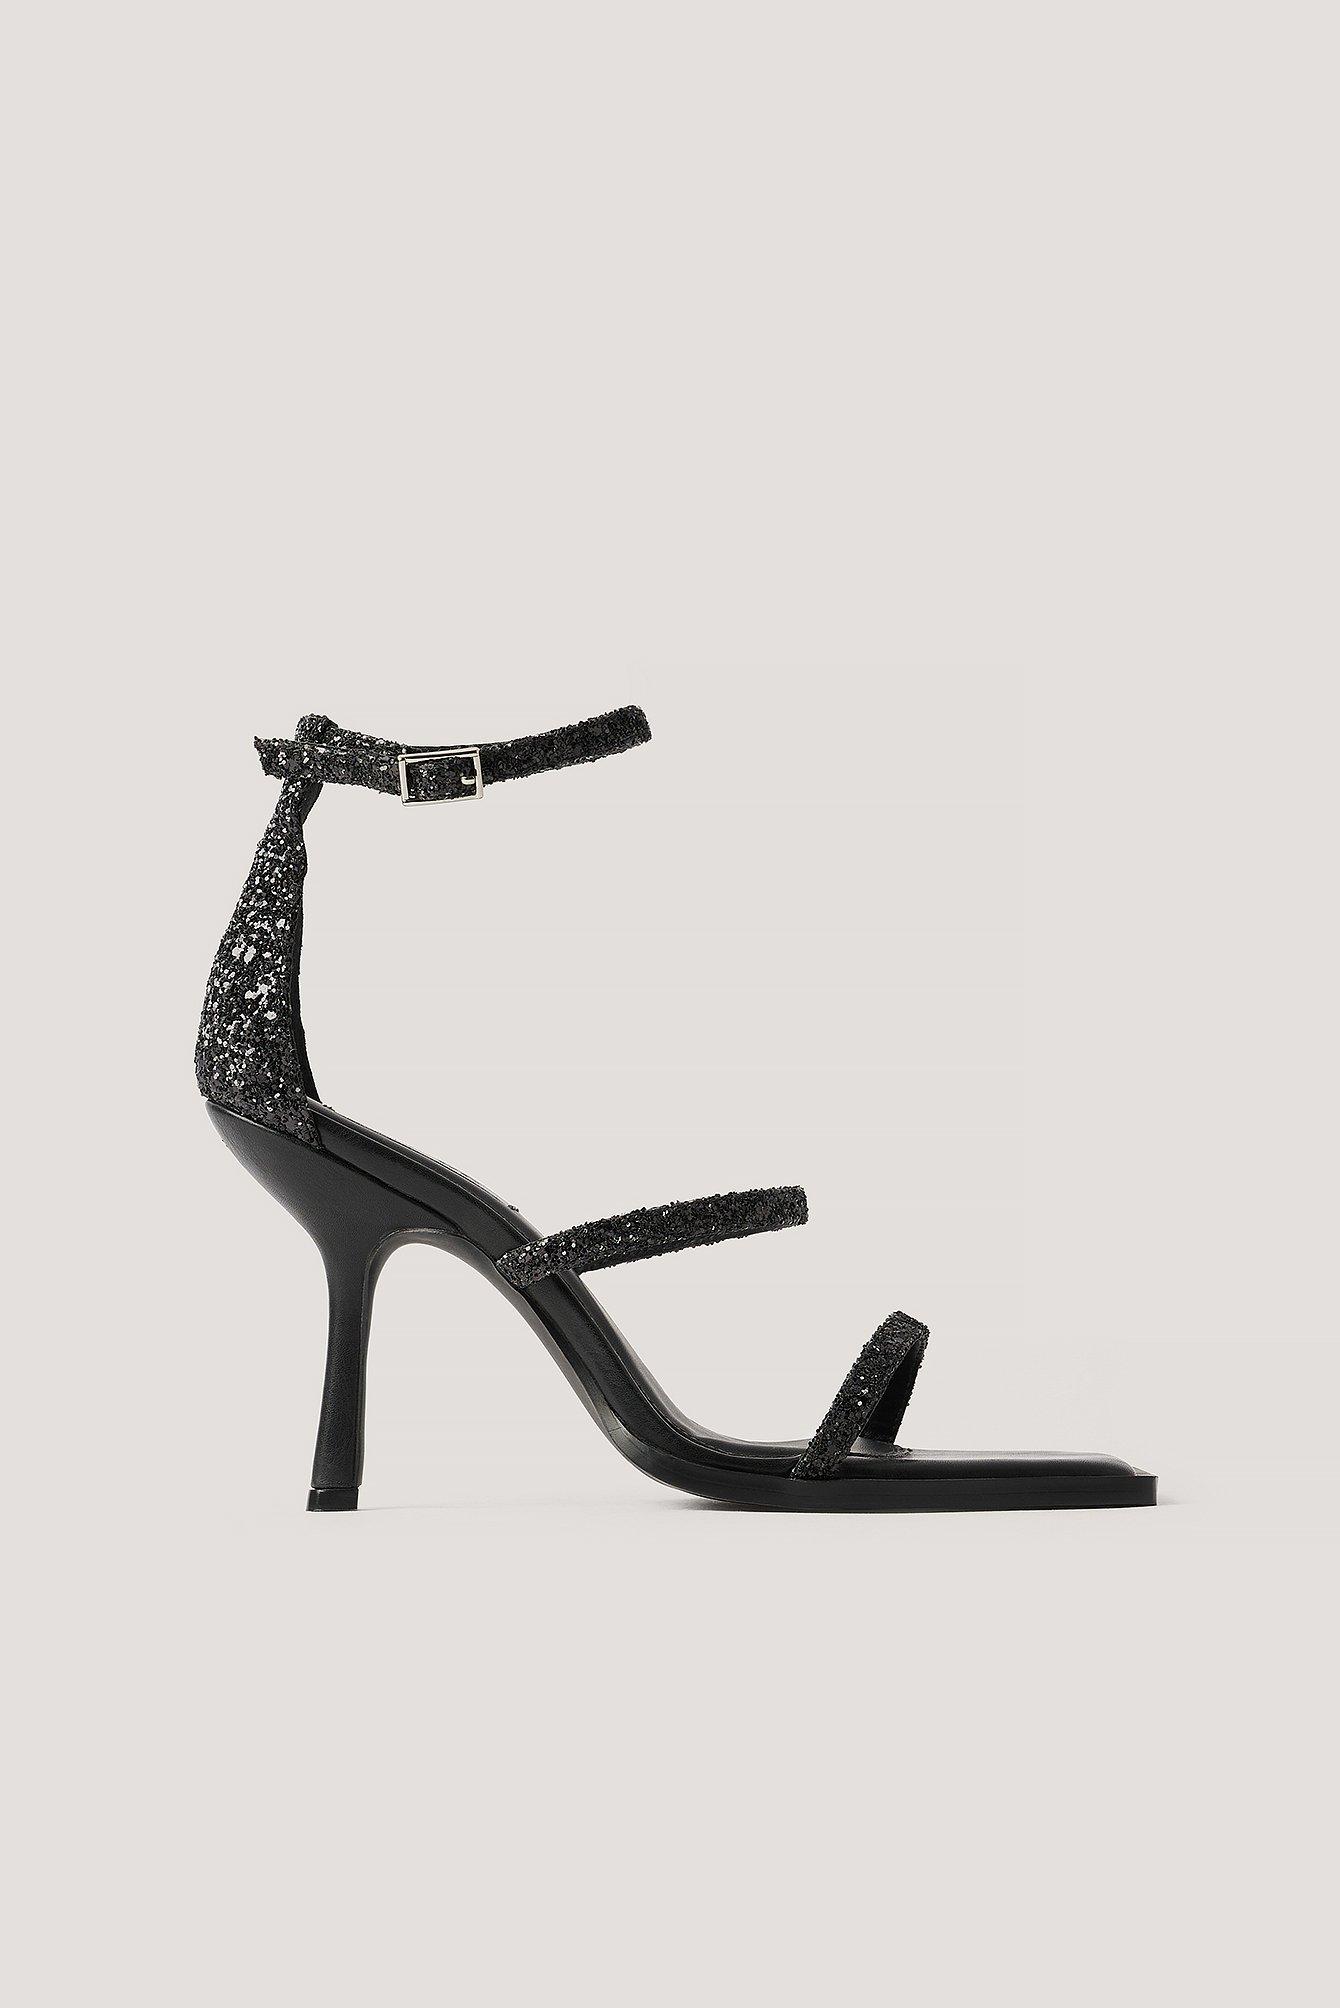 na-kd shoes -  Absatzsandalen Mit Glitzer - Black